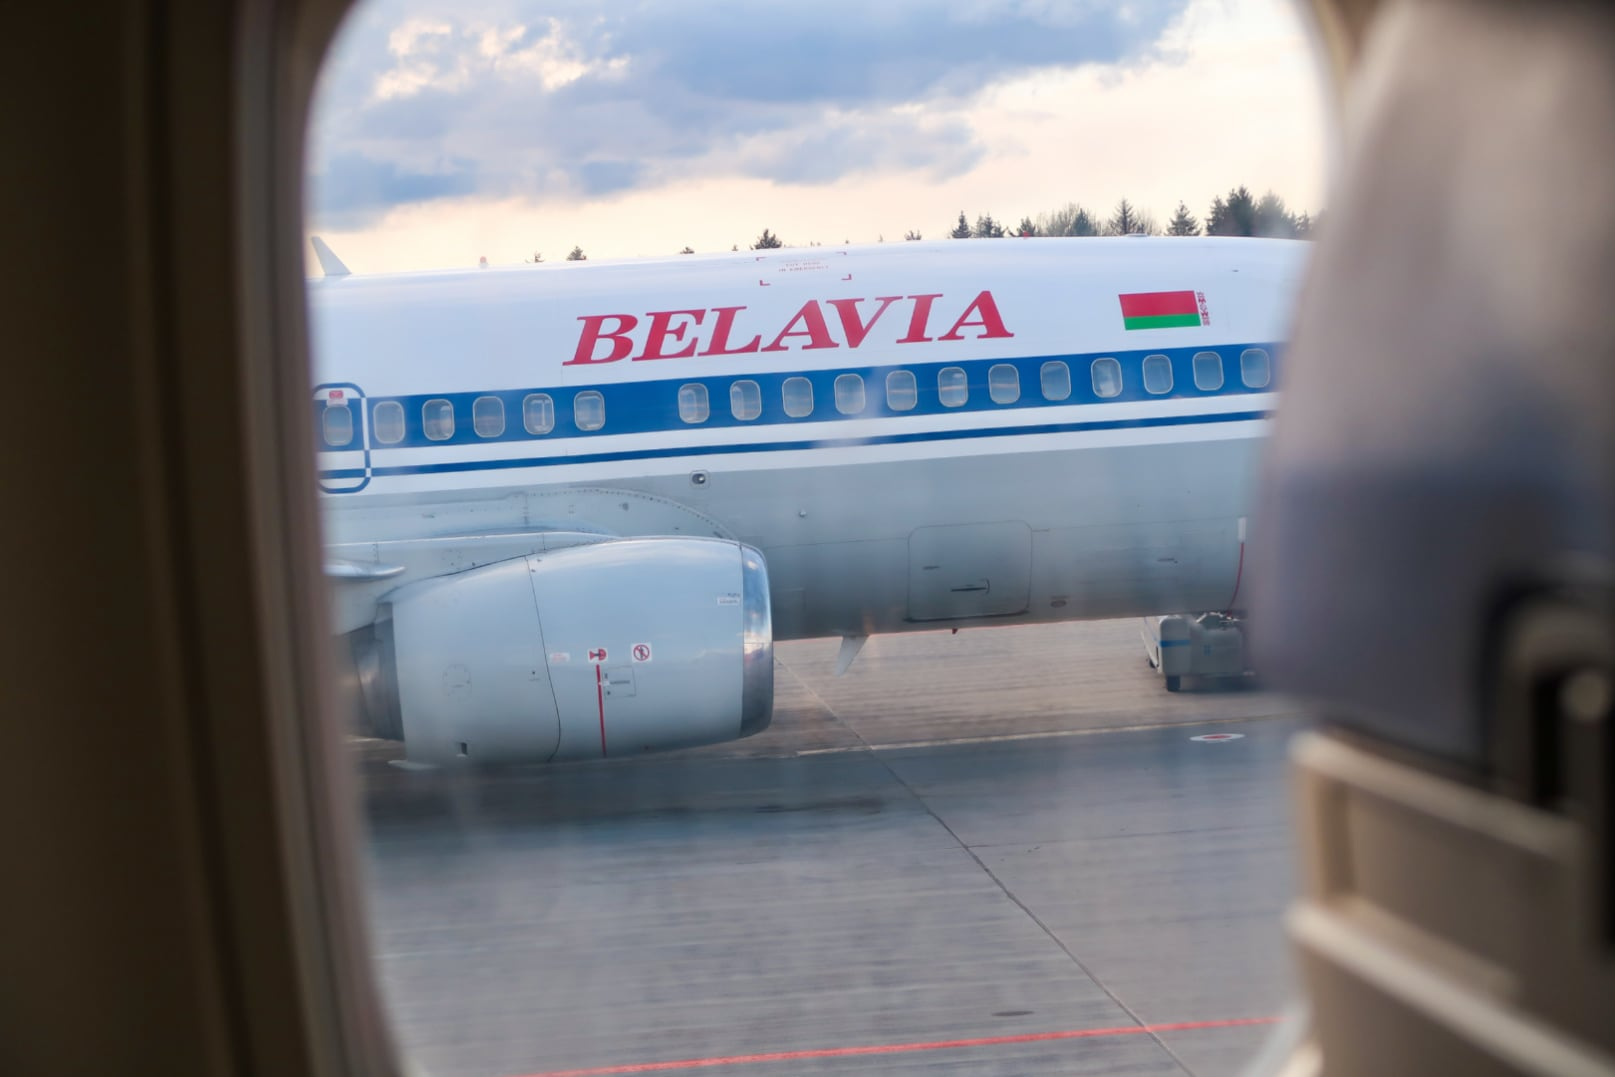 Sway the way petersburg belavia